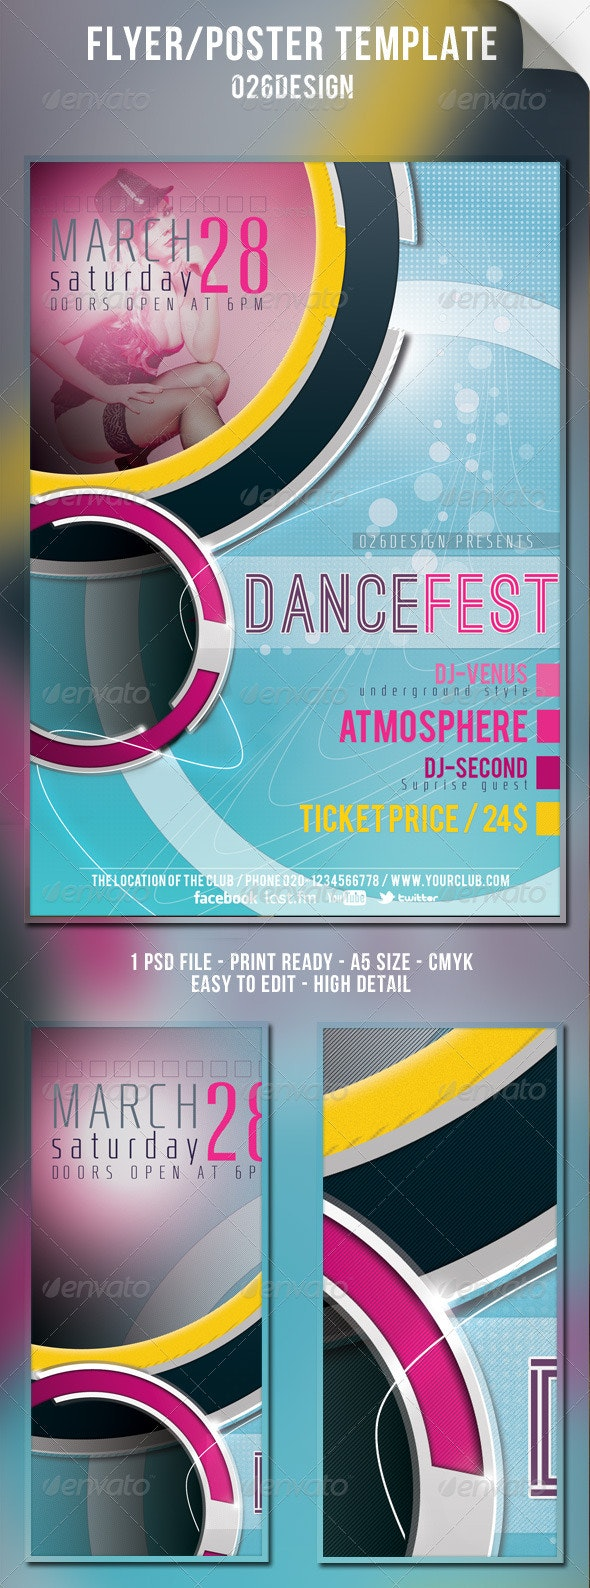 Dance Club Party Flyer - Flyers Print Templates